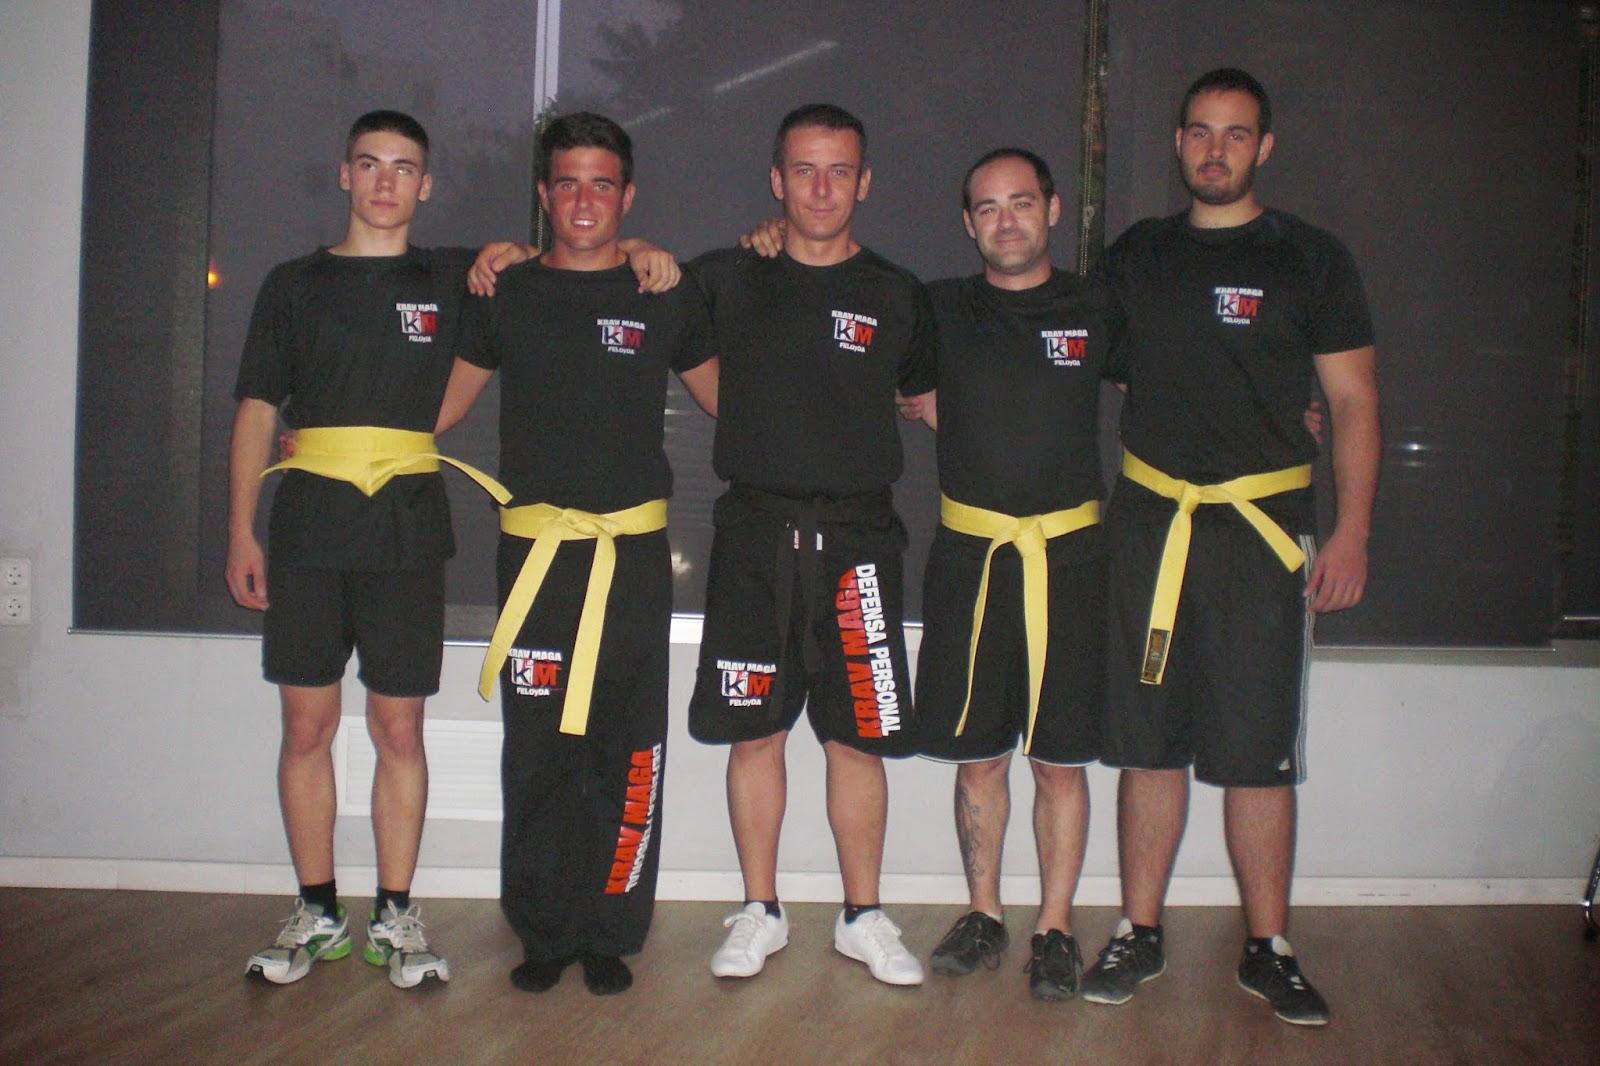 Primeros amarillo de Krav Maga Alicante!!!